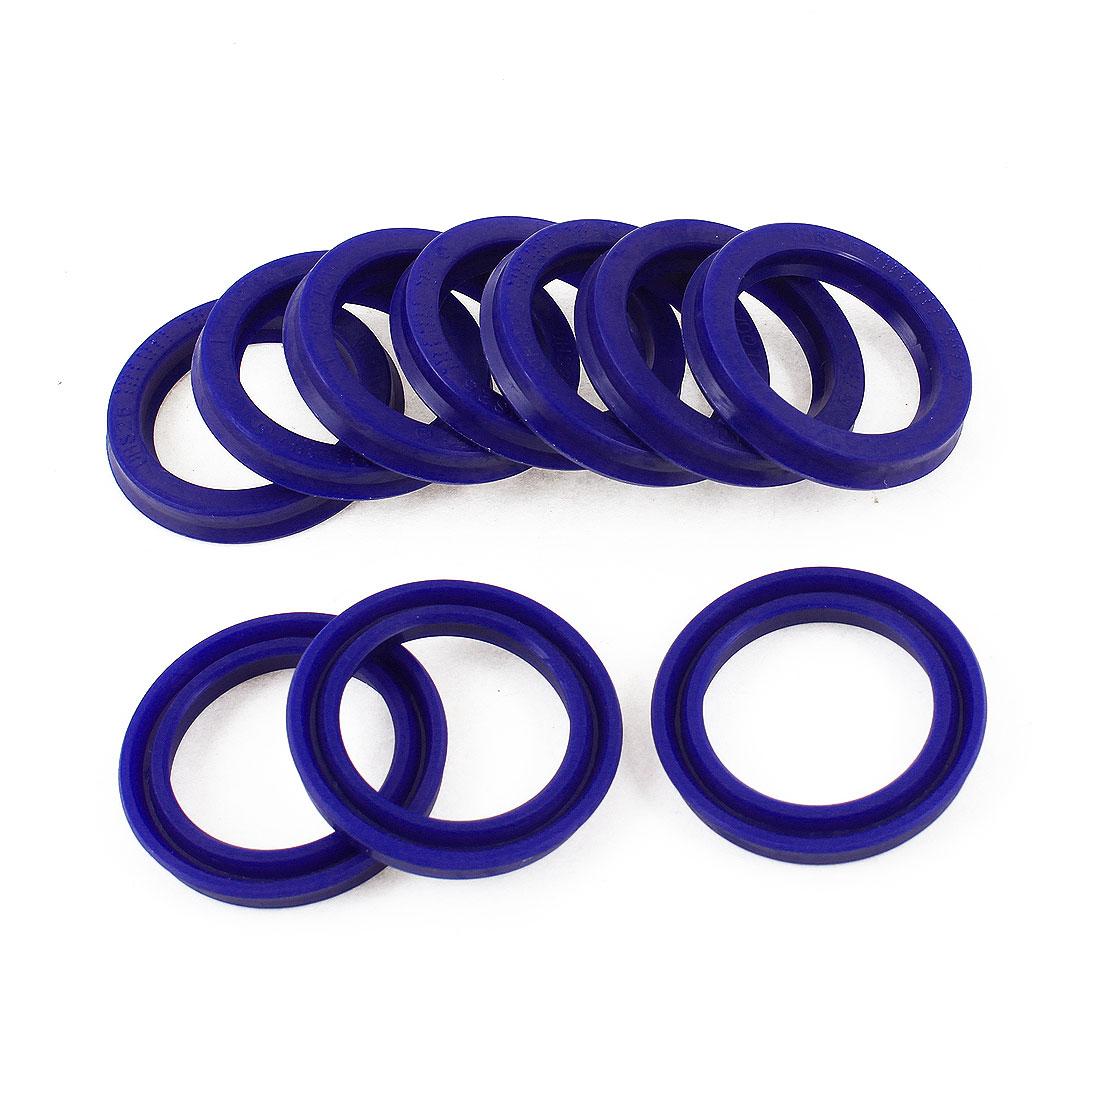 25mm x 33mm x 6mm Blue PU Oil Seal Dust Sealing Ring Gaskets 10 Pcs